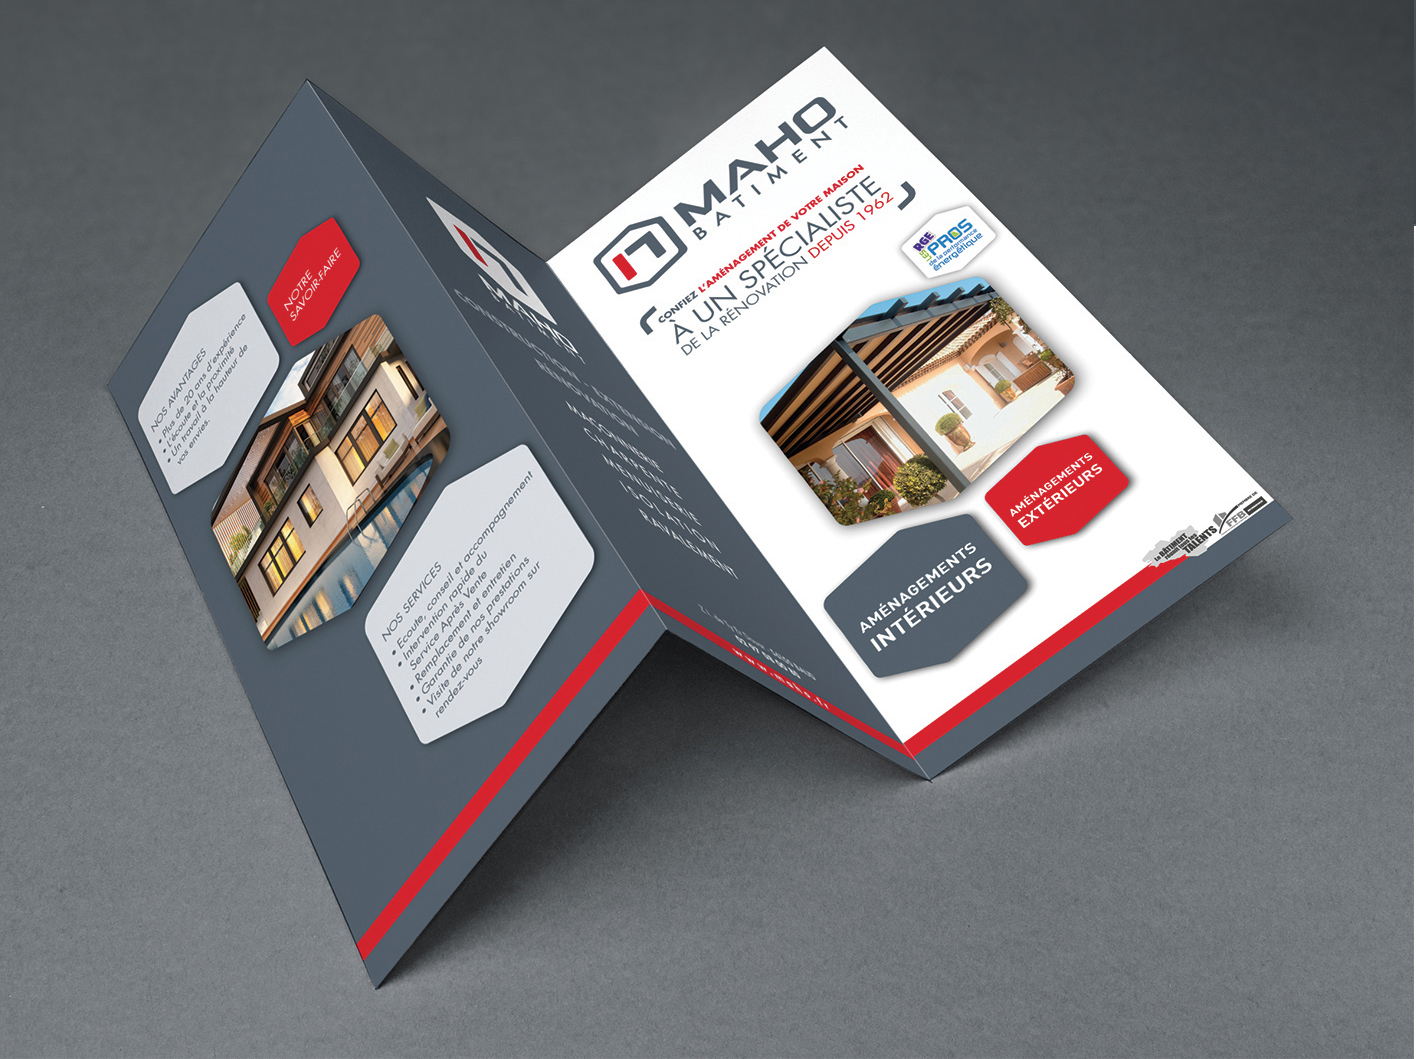 Maho-architecture-dépliant-logo-communication-bretagne